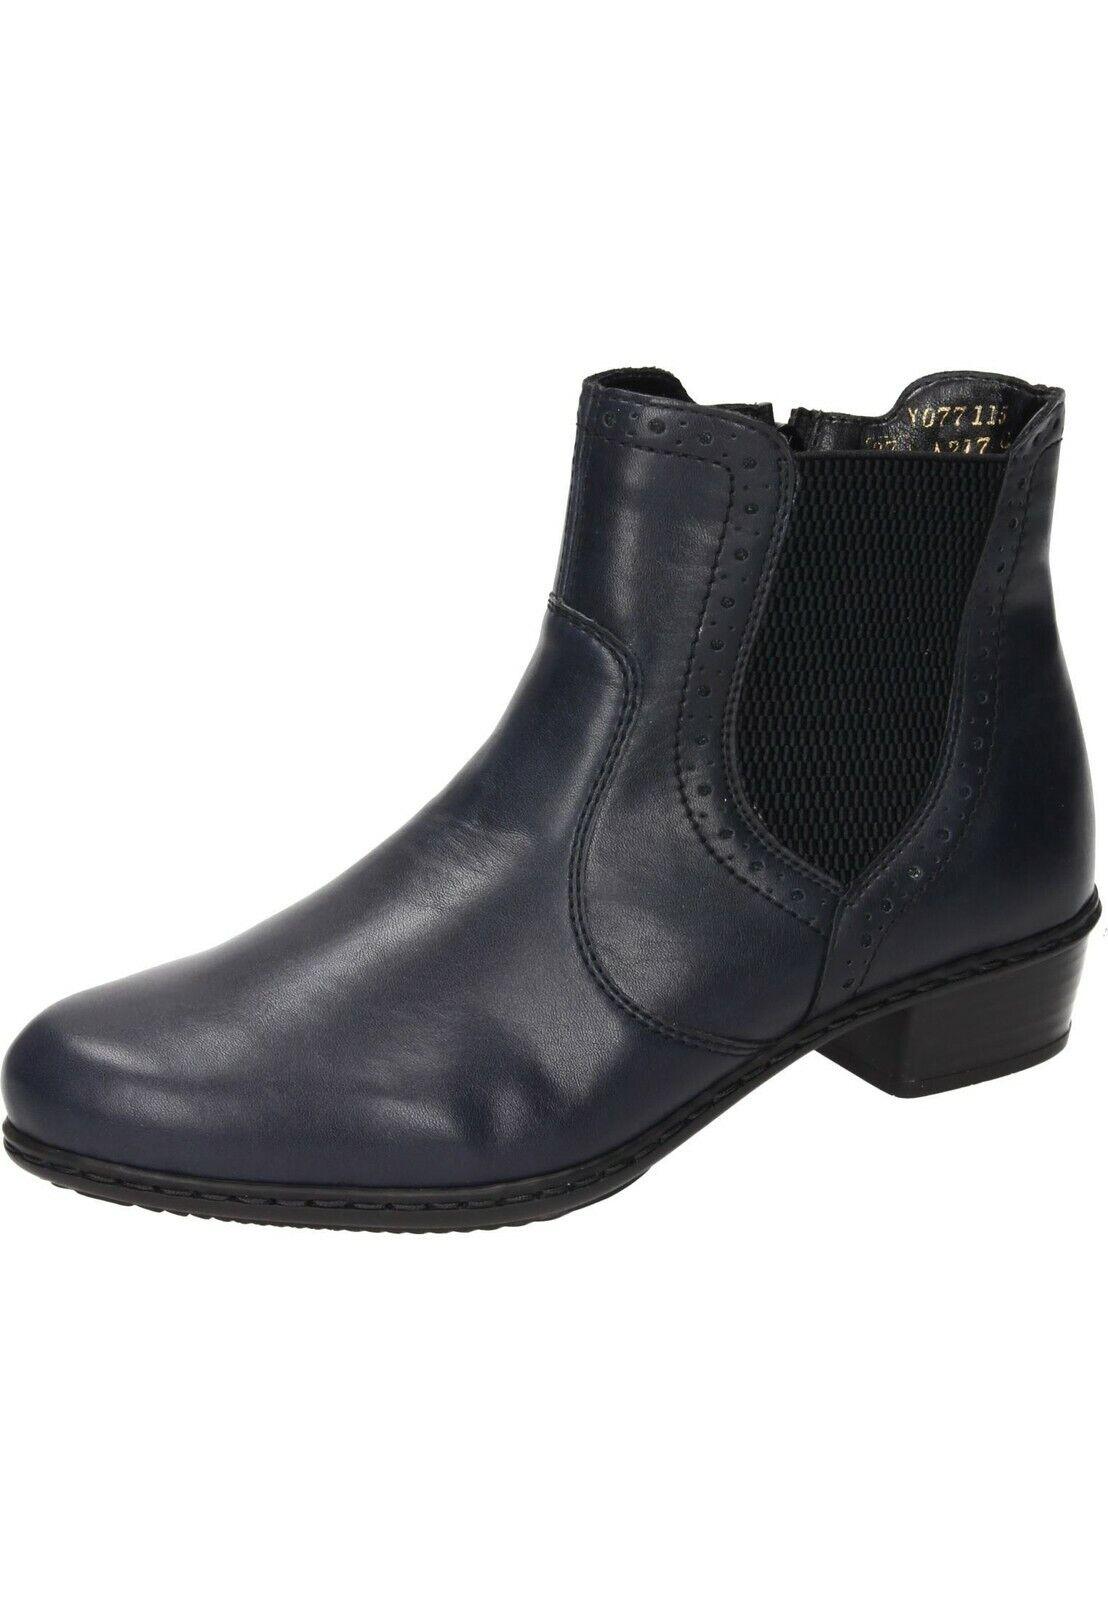 Rieker Y0771-15 Stiefeletten Stiefel Ankle Stiefel Schuhe blau Gr.36-42 Neu4  | Wunderbar